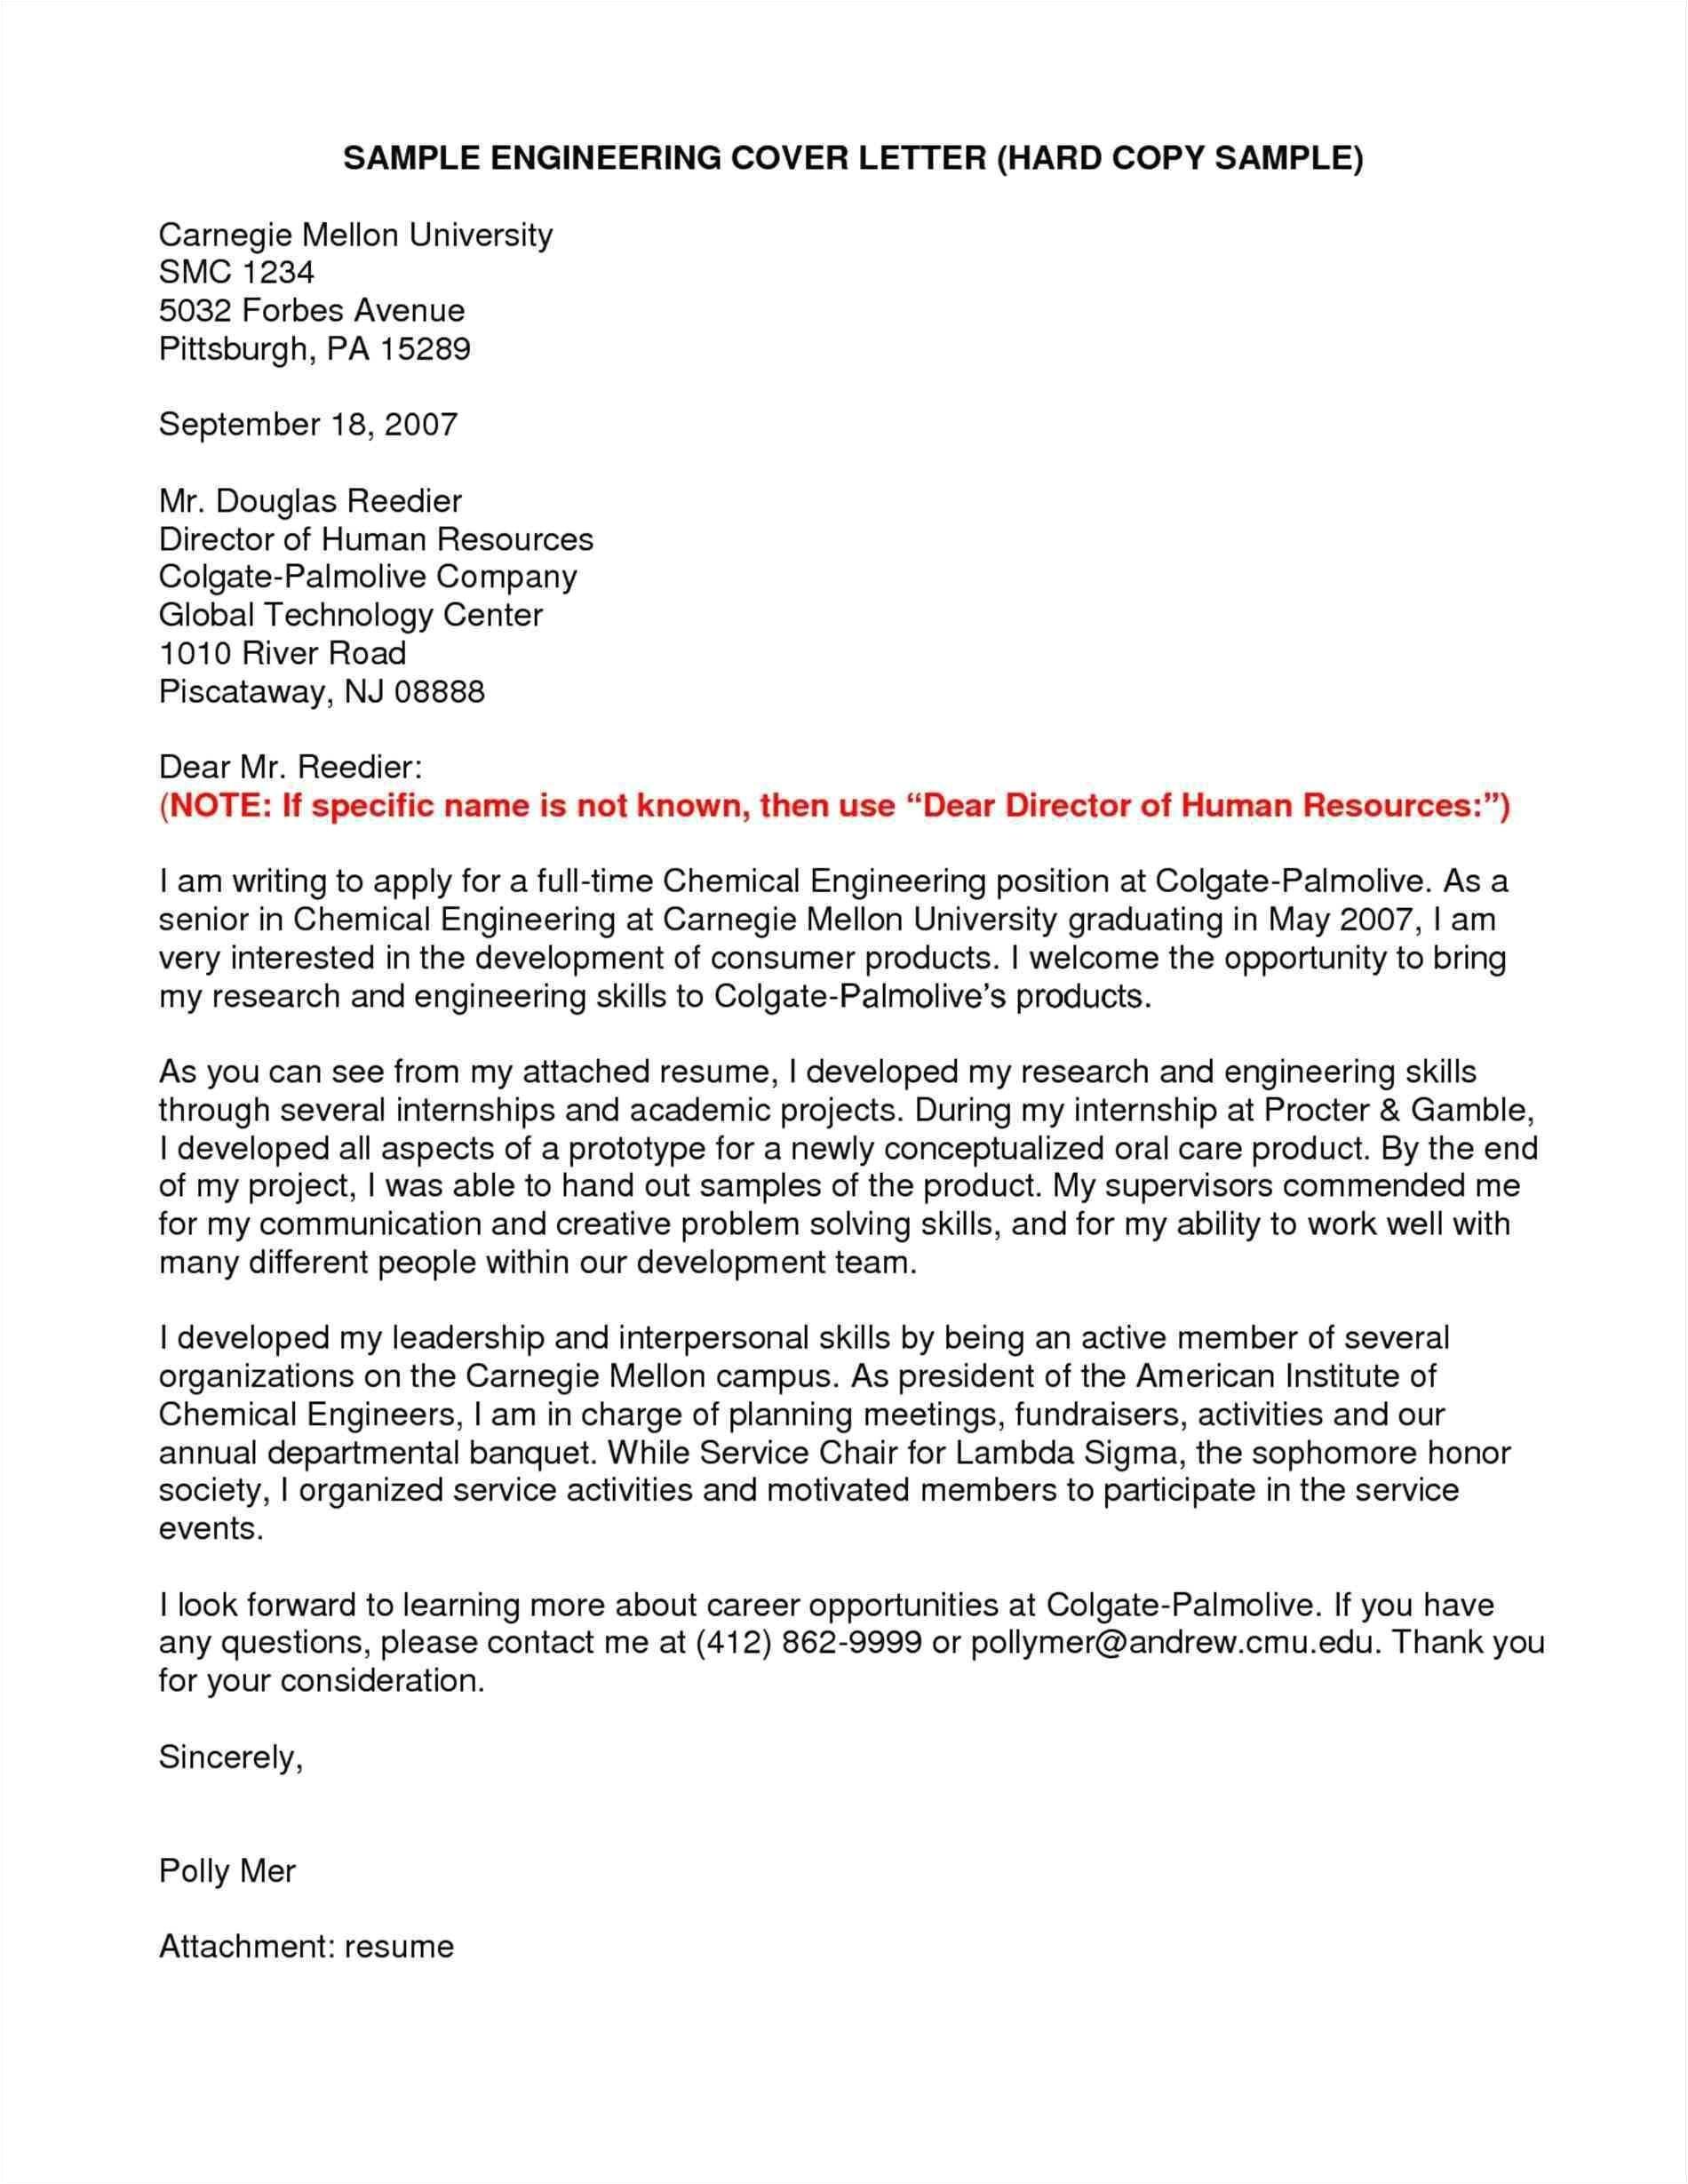 cover letter samples for engineering graduate new job application cover letter for fresh chemical engineering graduate